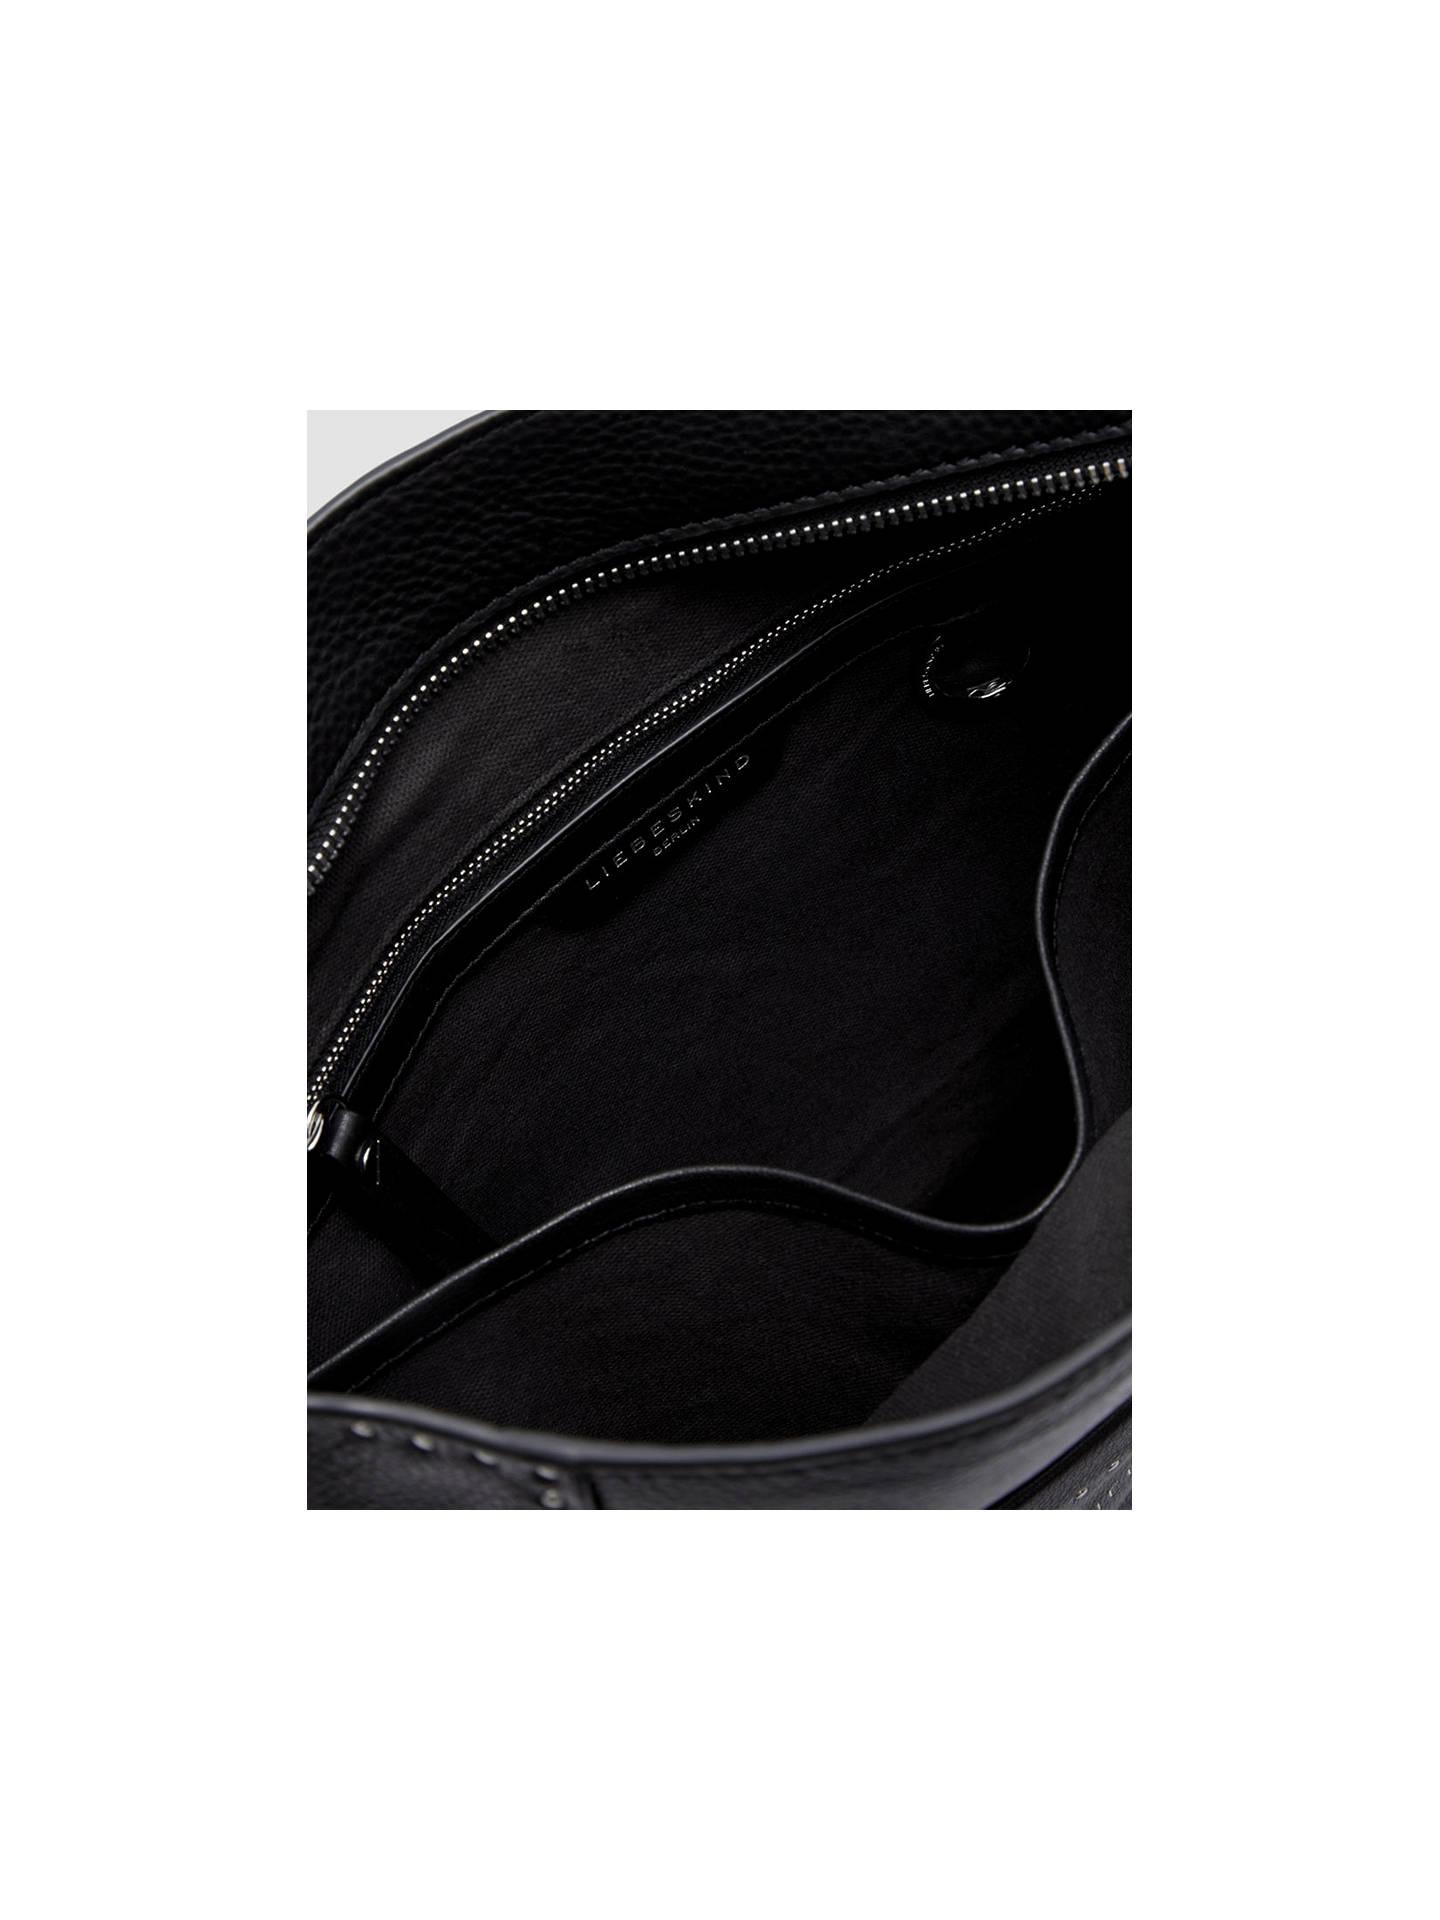 1c6427ac3a44 ... BuyLiebeskind Berlin Stud Love Leather Medium Hobo Bag